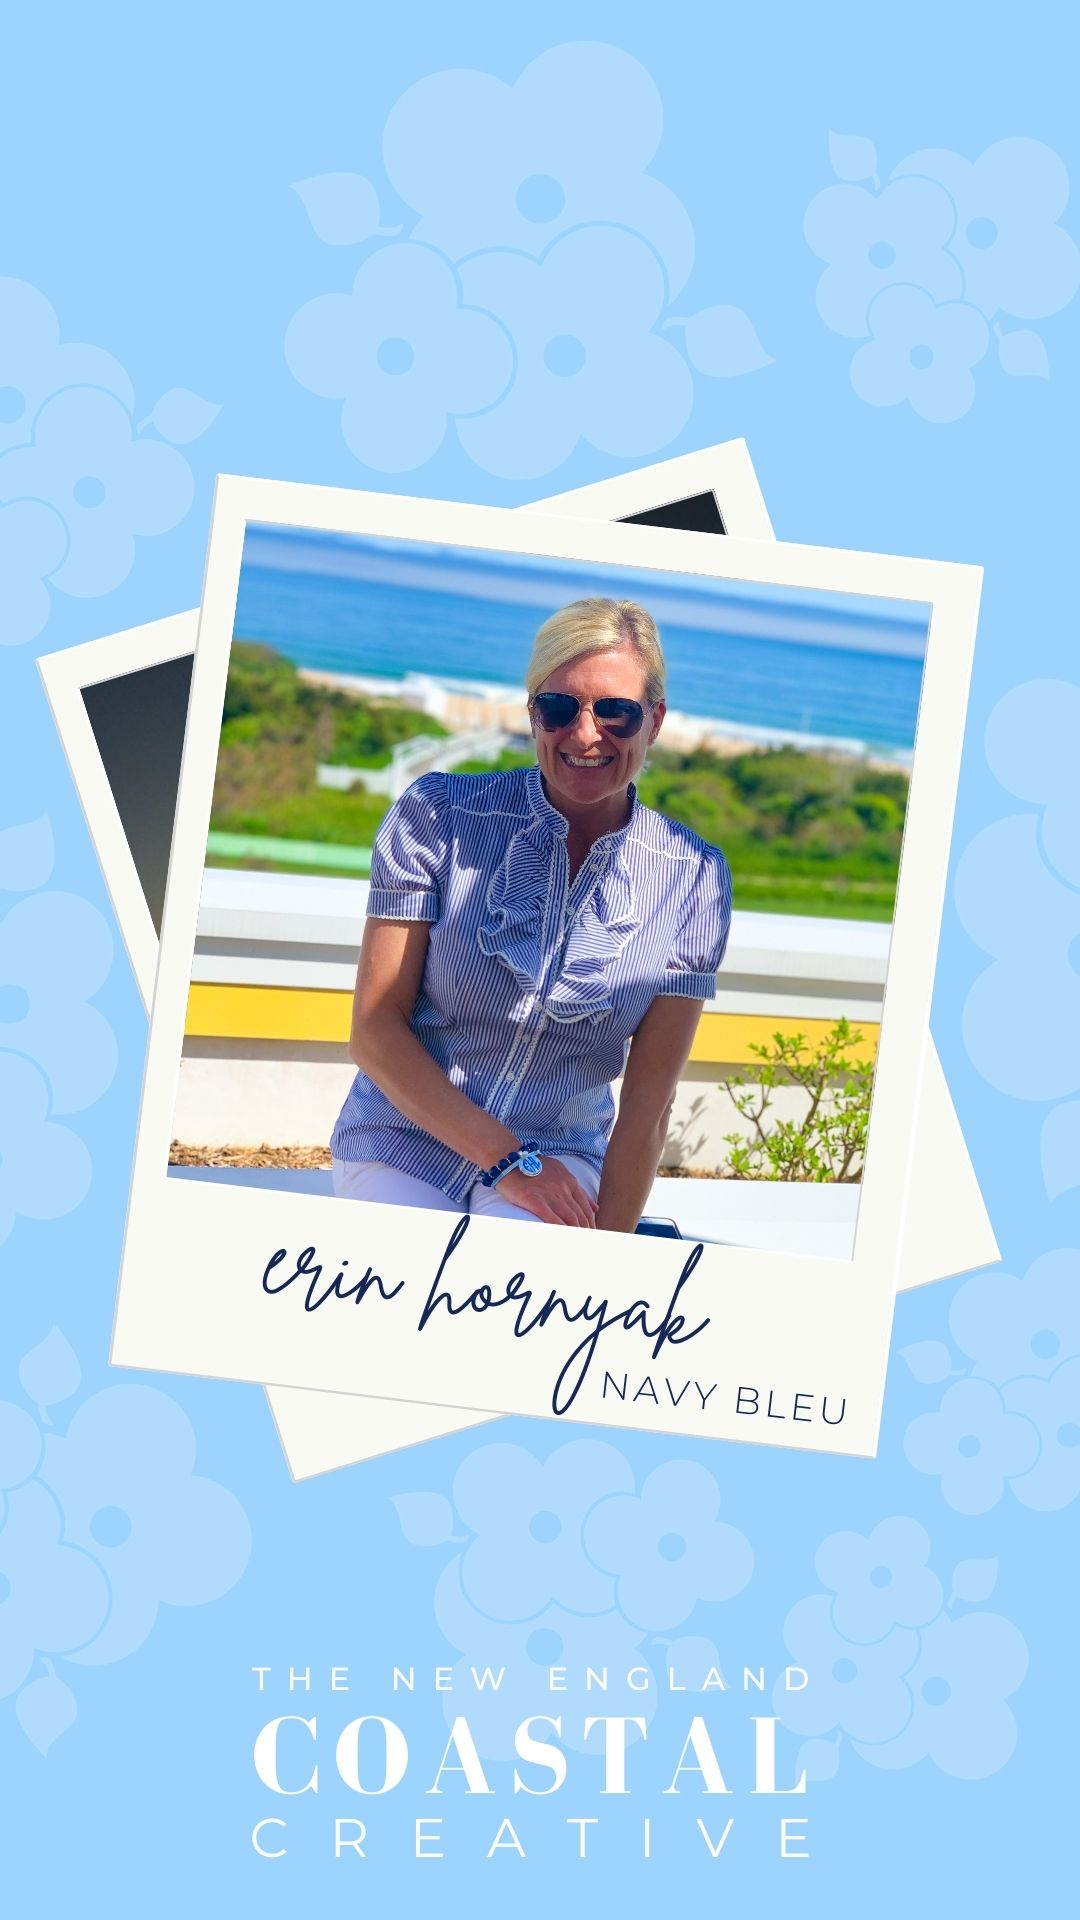 navyBleu-Erin-Hornyak-member1-1